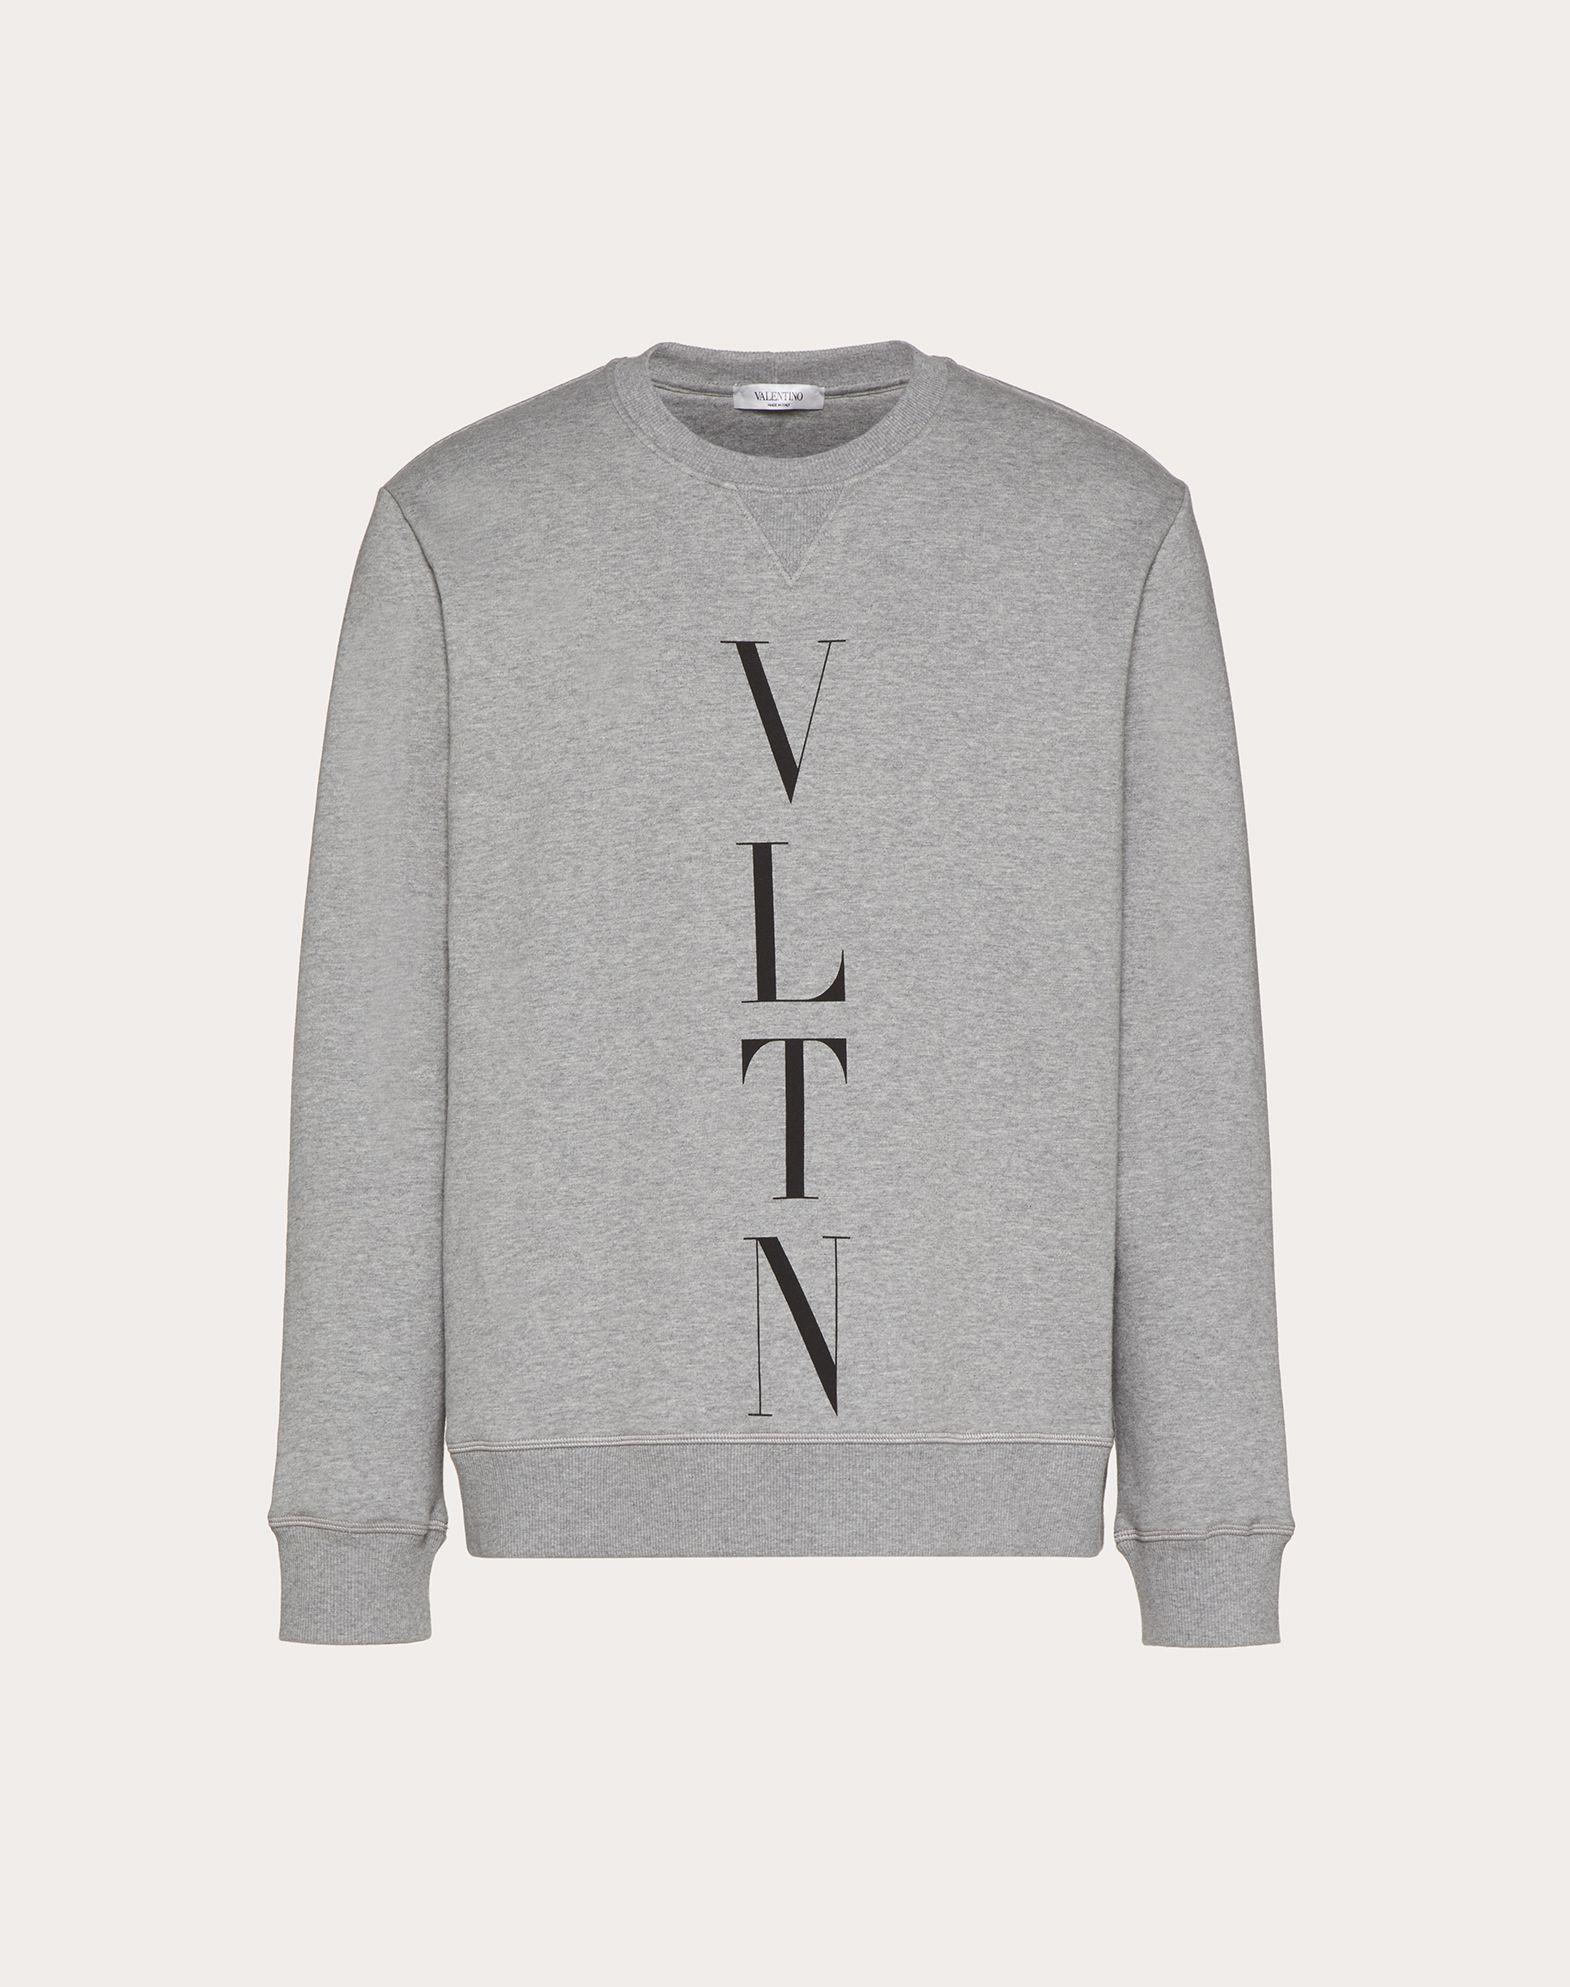 VALENTINO UOMO VLTN crew-neck sweatshirt Sweatshirt U f